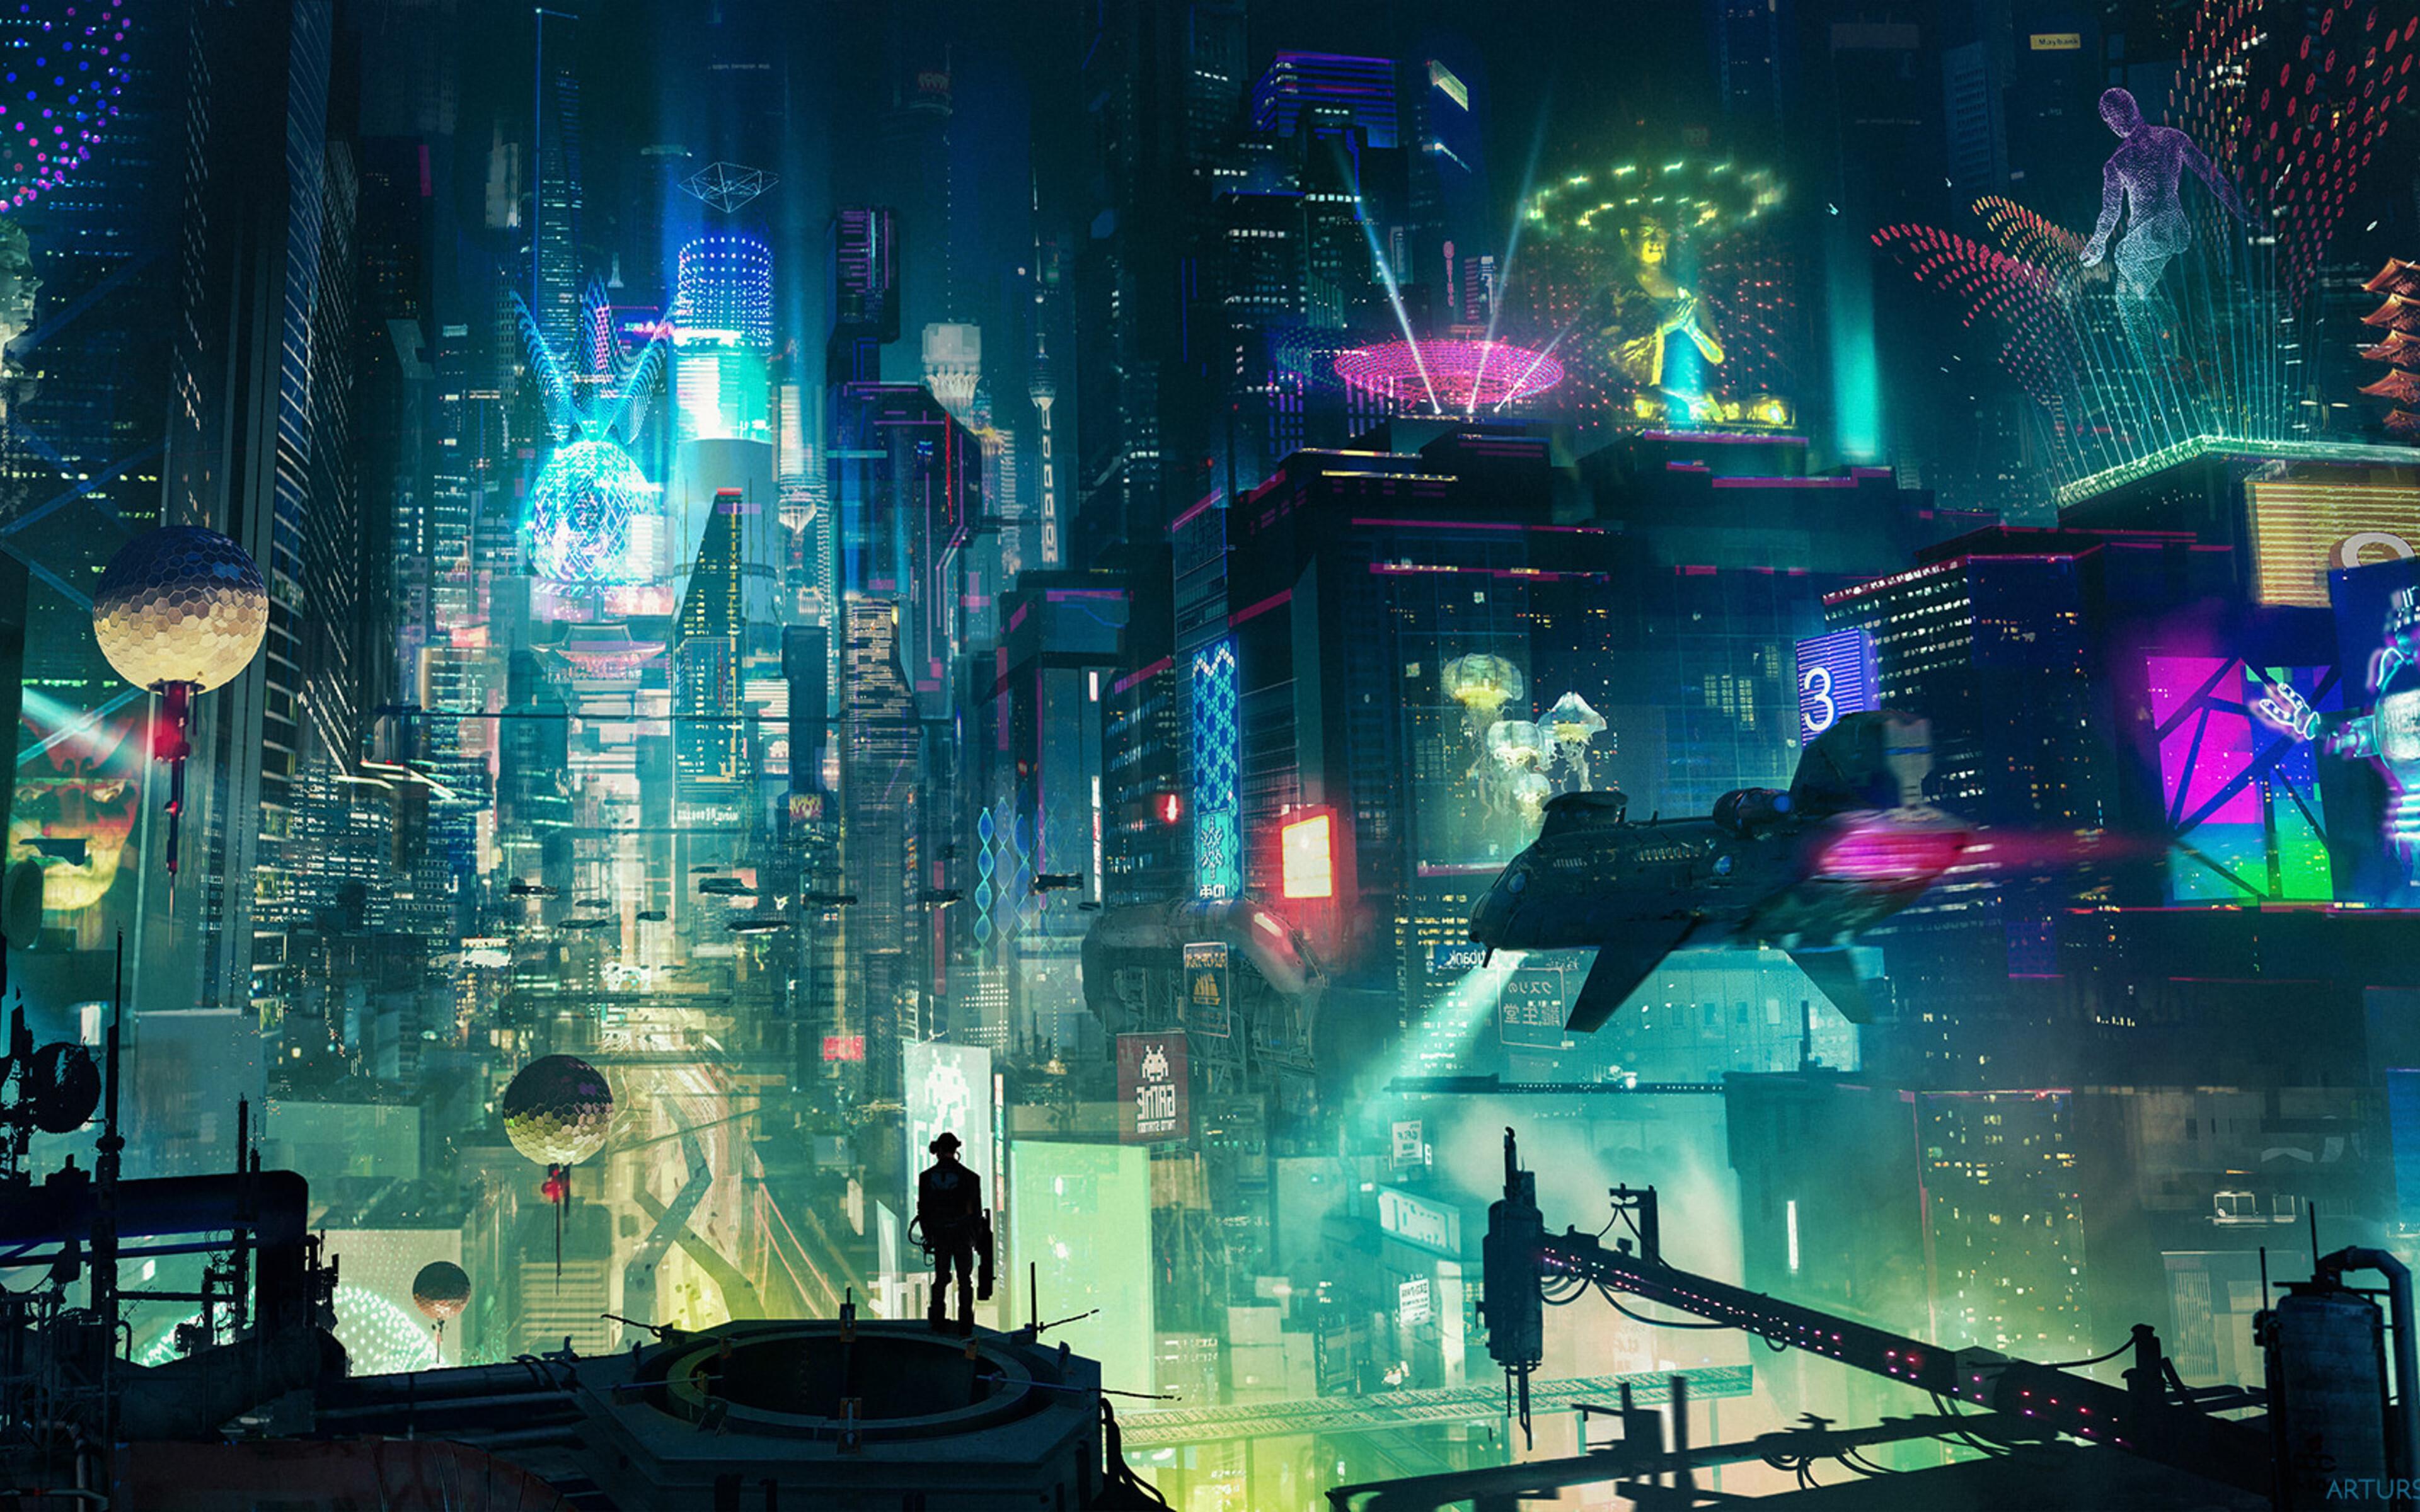 3840x2400 Cyberpunk City 4k HD 4k Wallpapers, Images ...